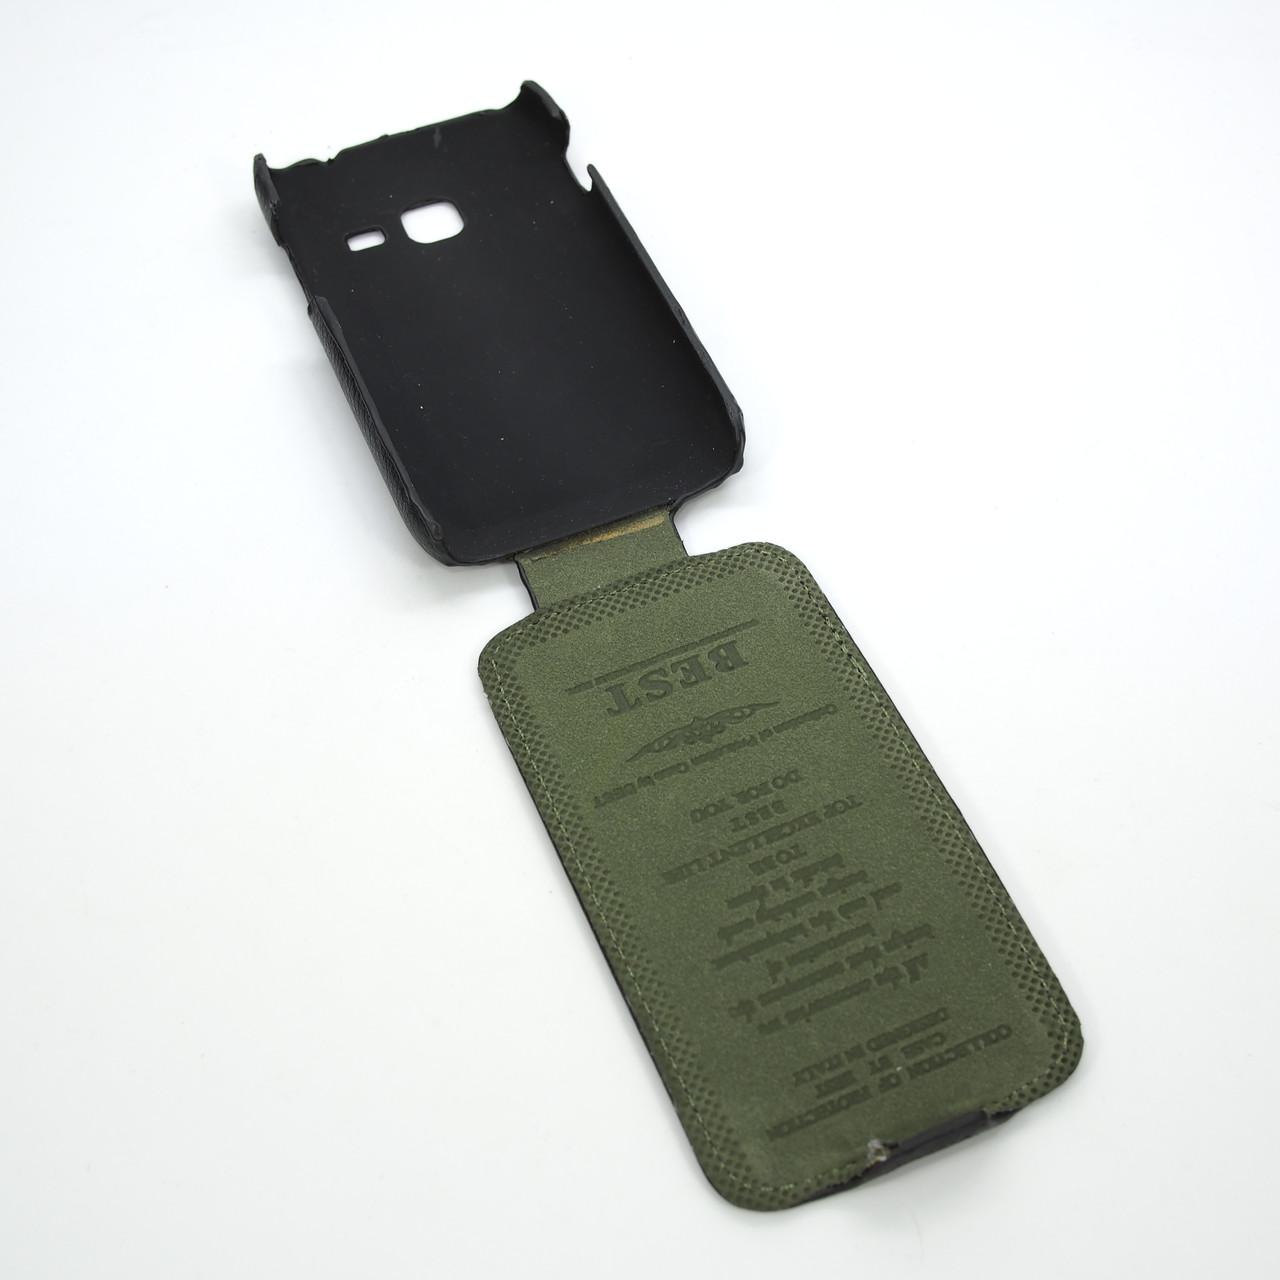 Чехол Best Vip Samsung S6802 black Galaxy Ace Duos (S6802)